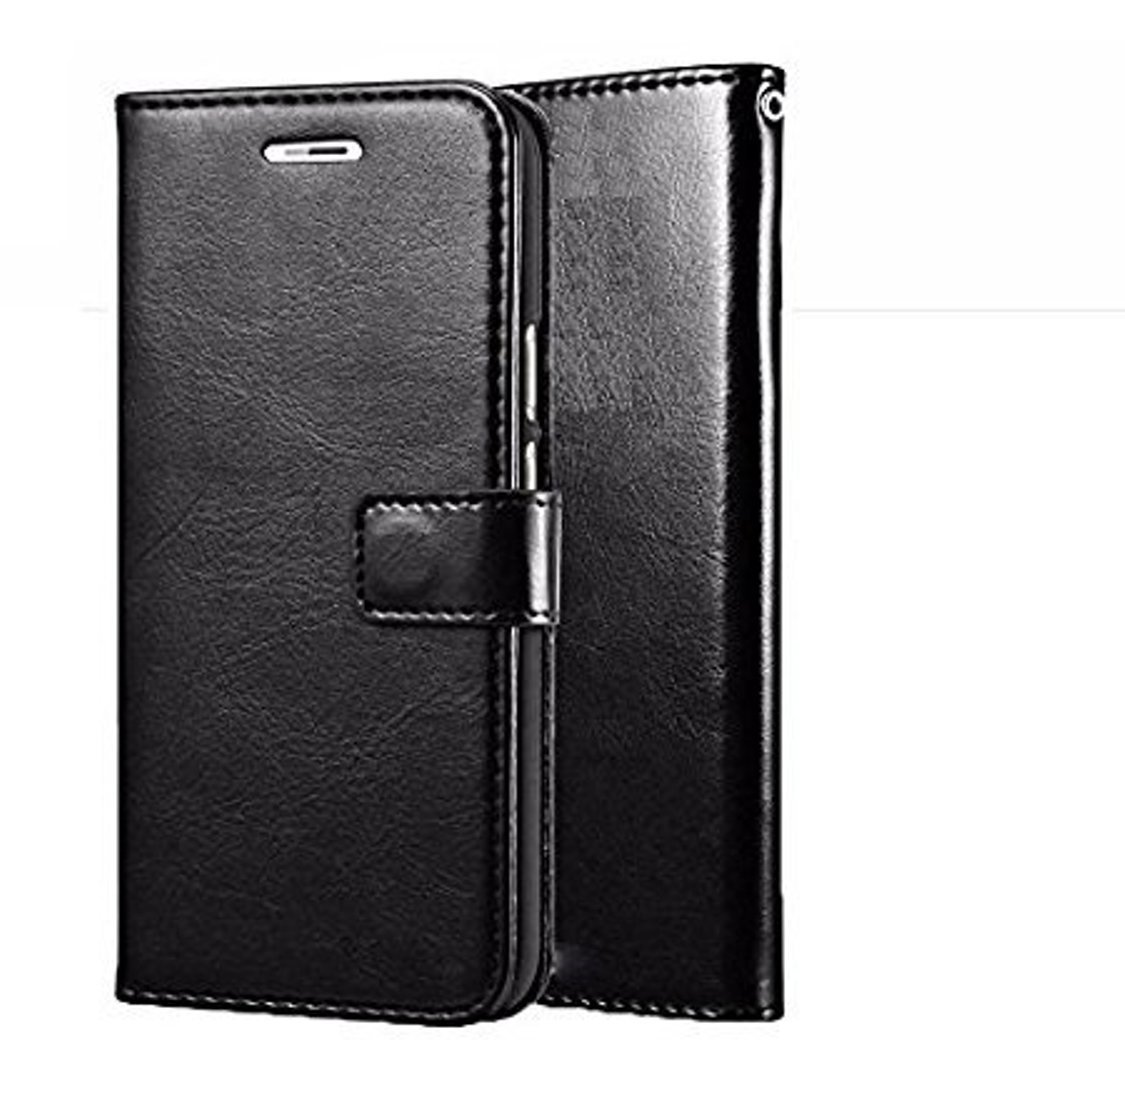 D G Kases Vintage Pu Leather Kickstand Wallet Flip Case Cover For Oppo F3 Plus   Black